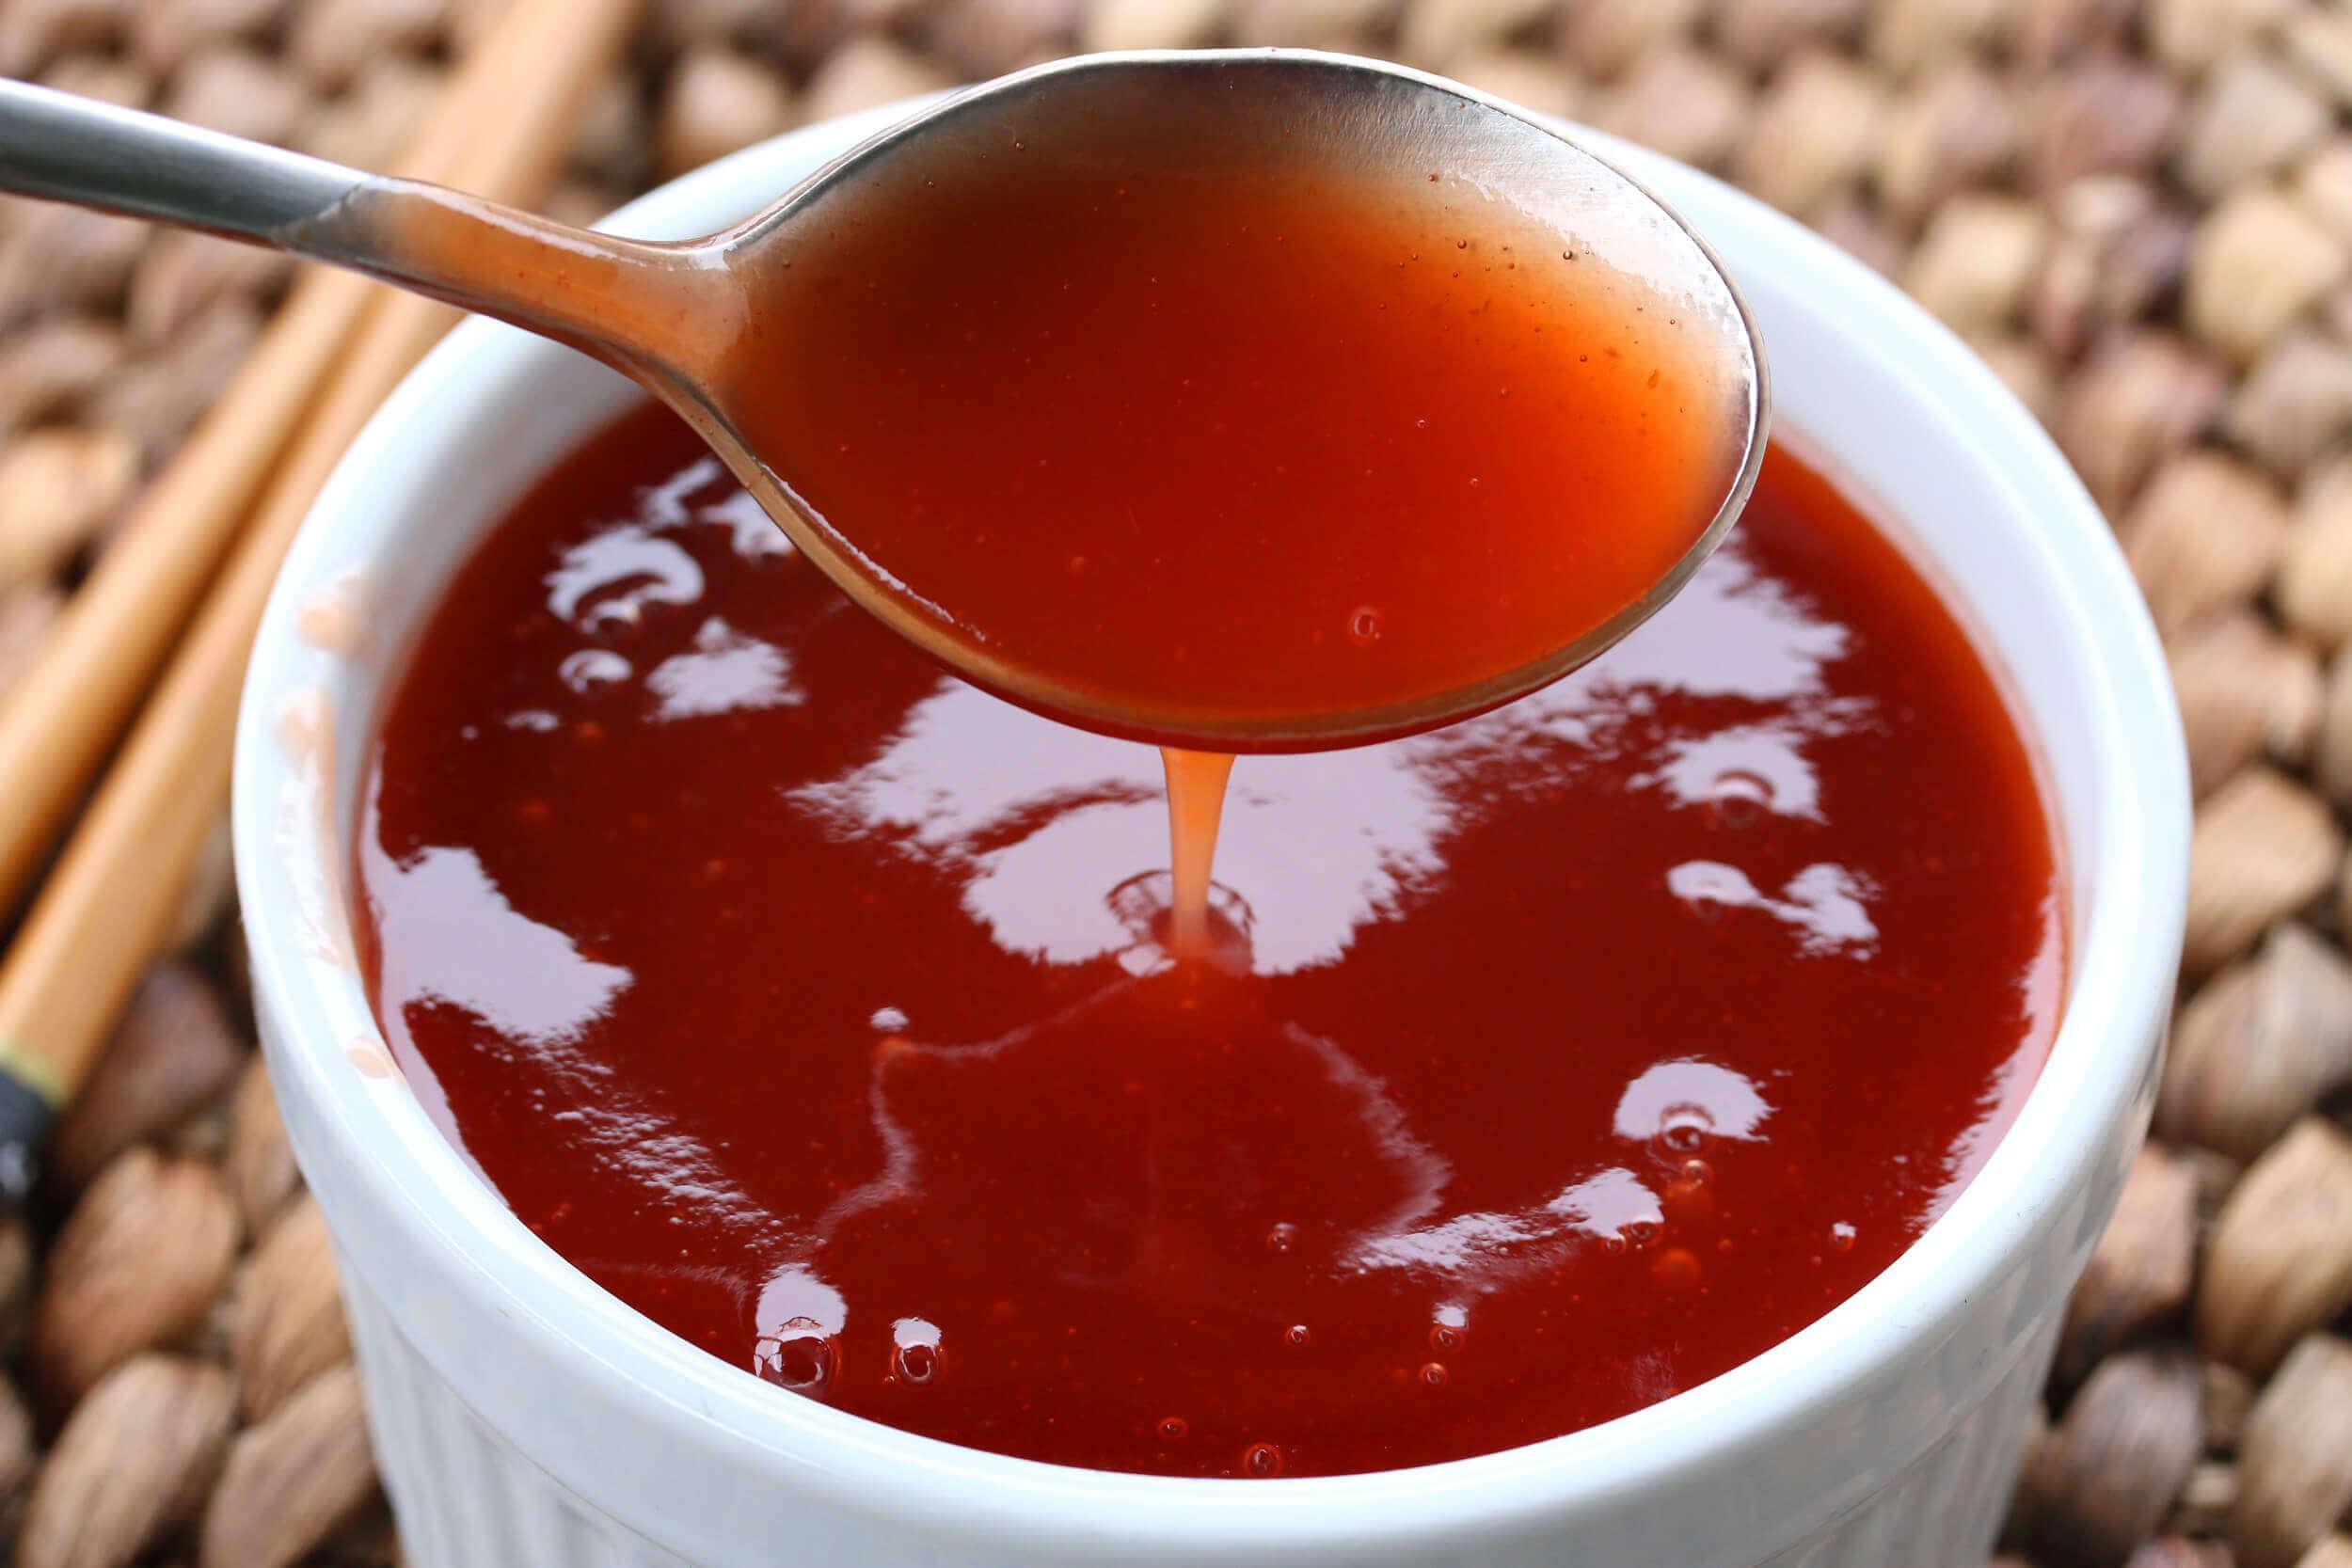 Best Sweet & Sour Sauce from Daring Gourmet